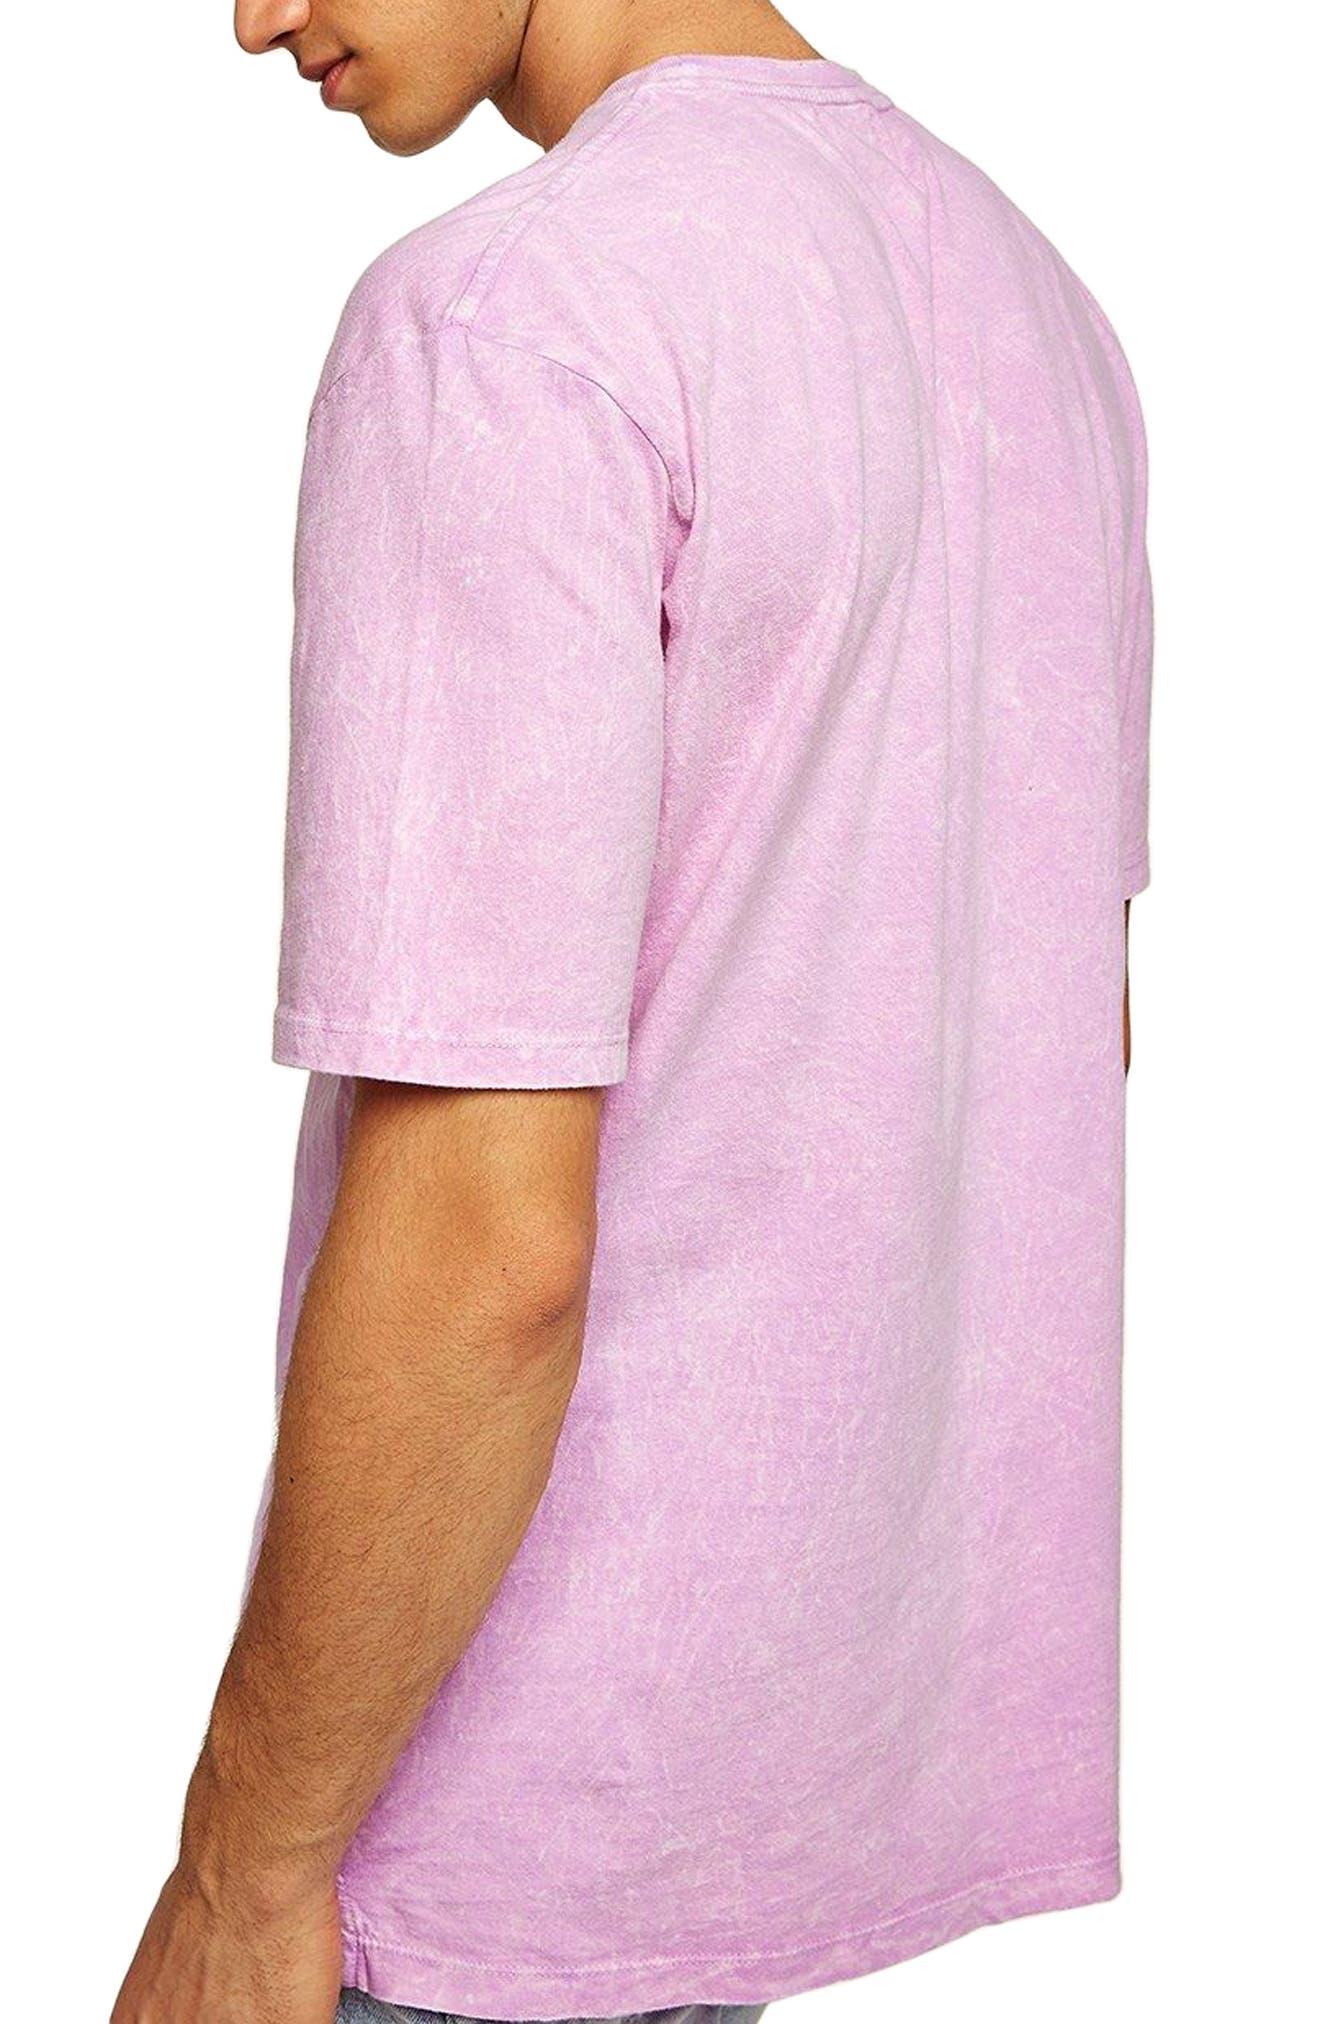 Acid Wash Pocket T-Shirt,                             Alternate thumbnail 2, color,                             Pink Multi